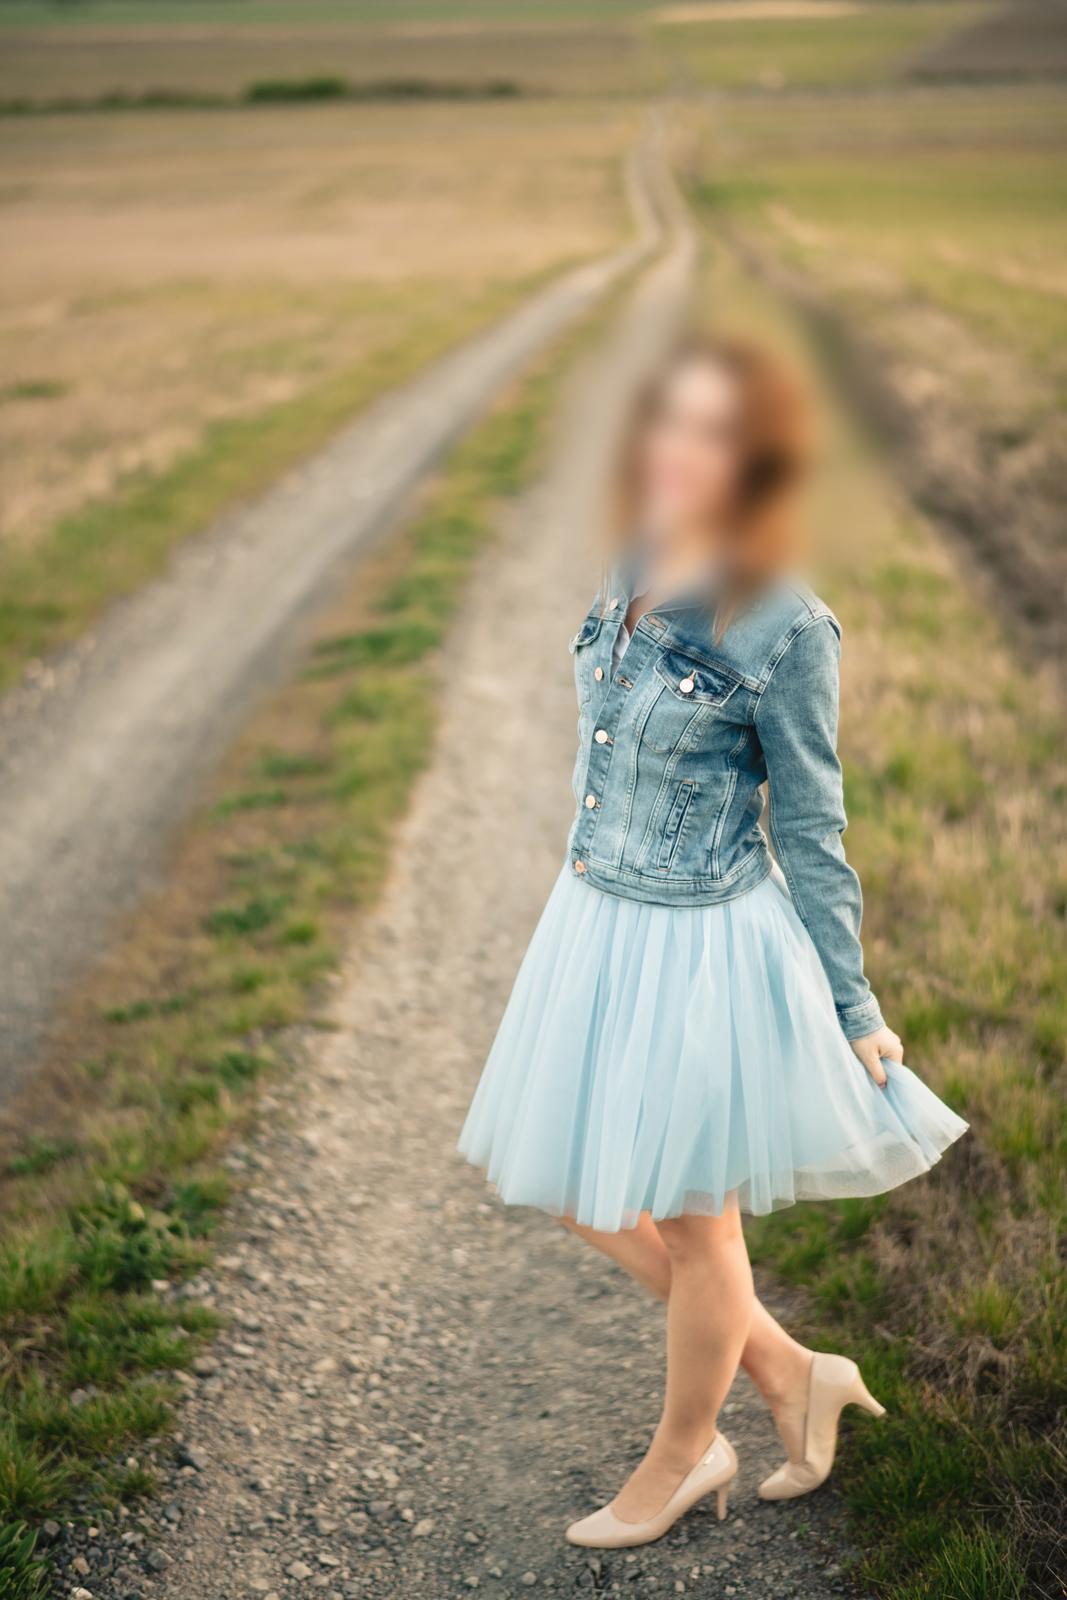 Tylová sukňa svetlomodrá - Obrázok č. 1